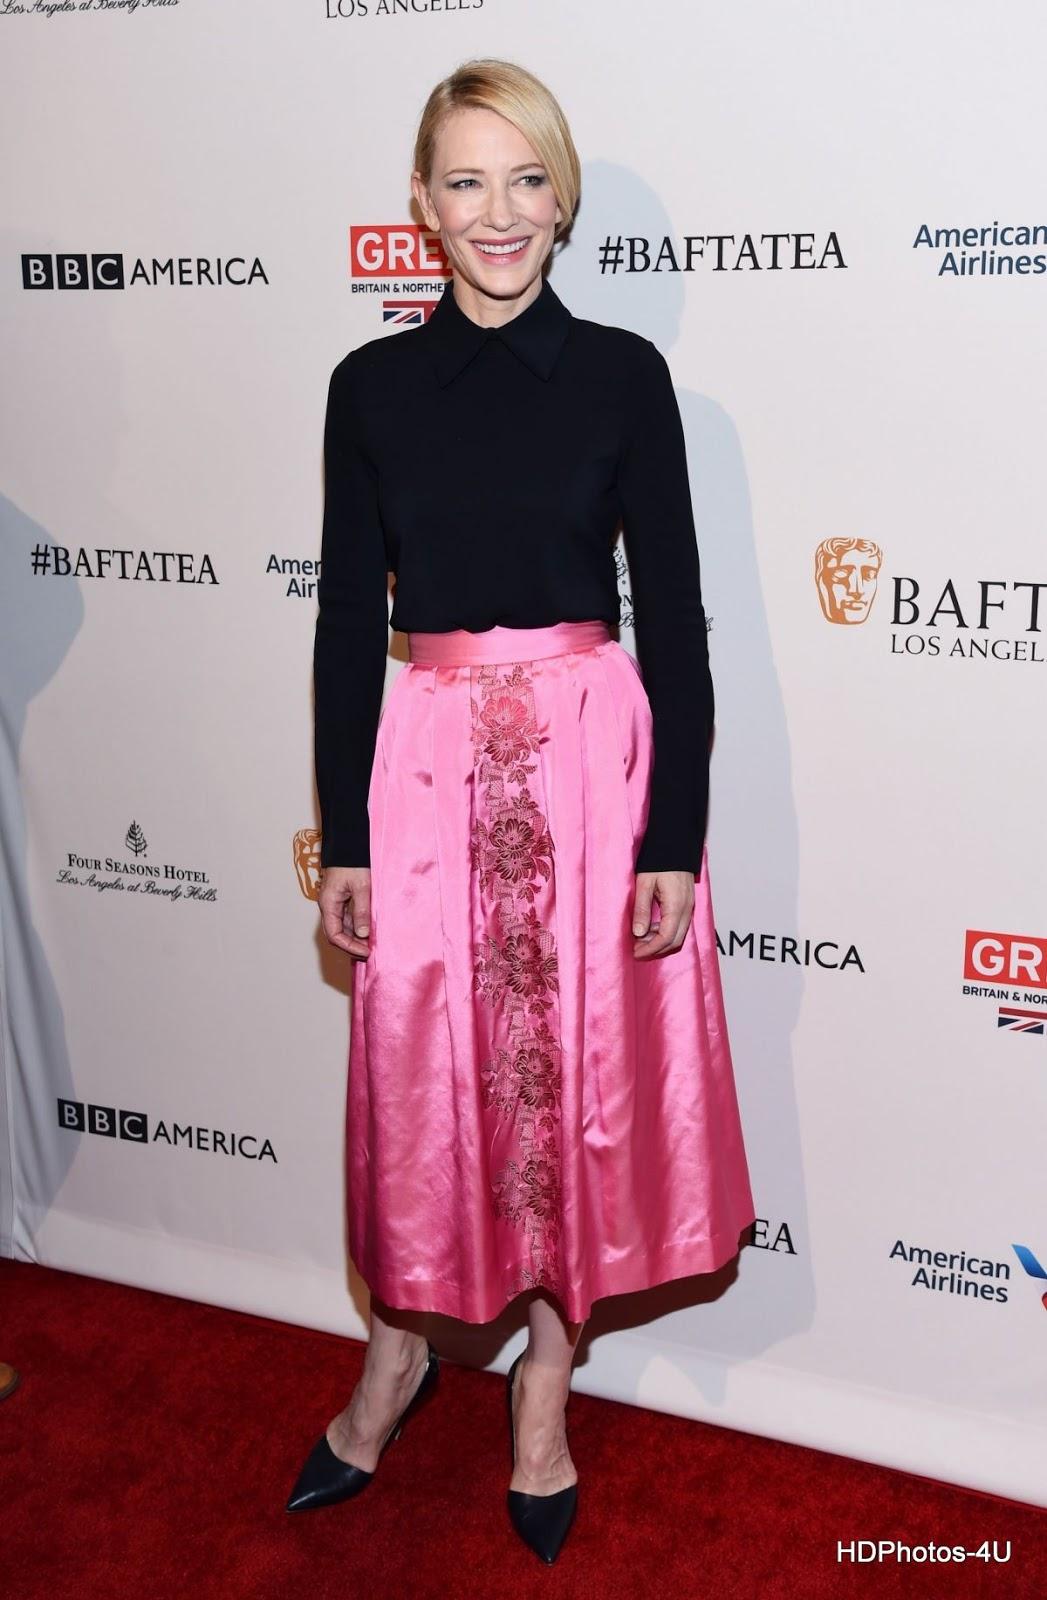 Full HQ Photos of Cate Blanchett at BAFTA Los Angeles Awards Season Tea in Los Angeles